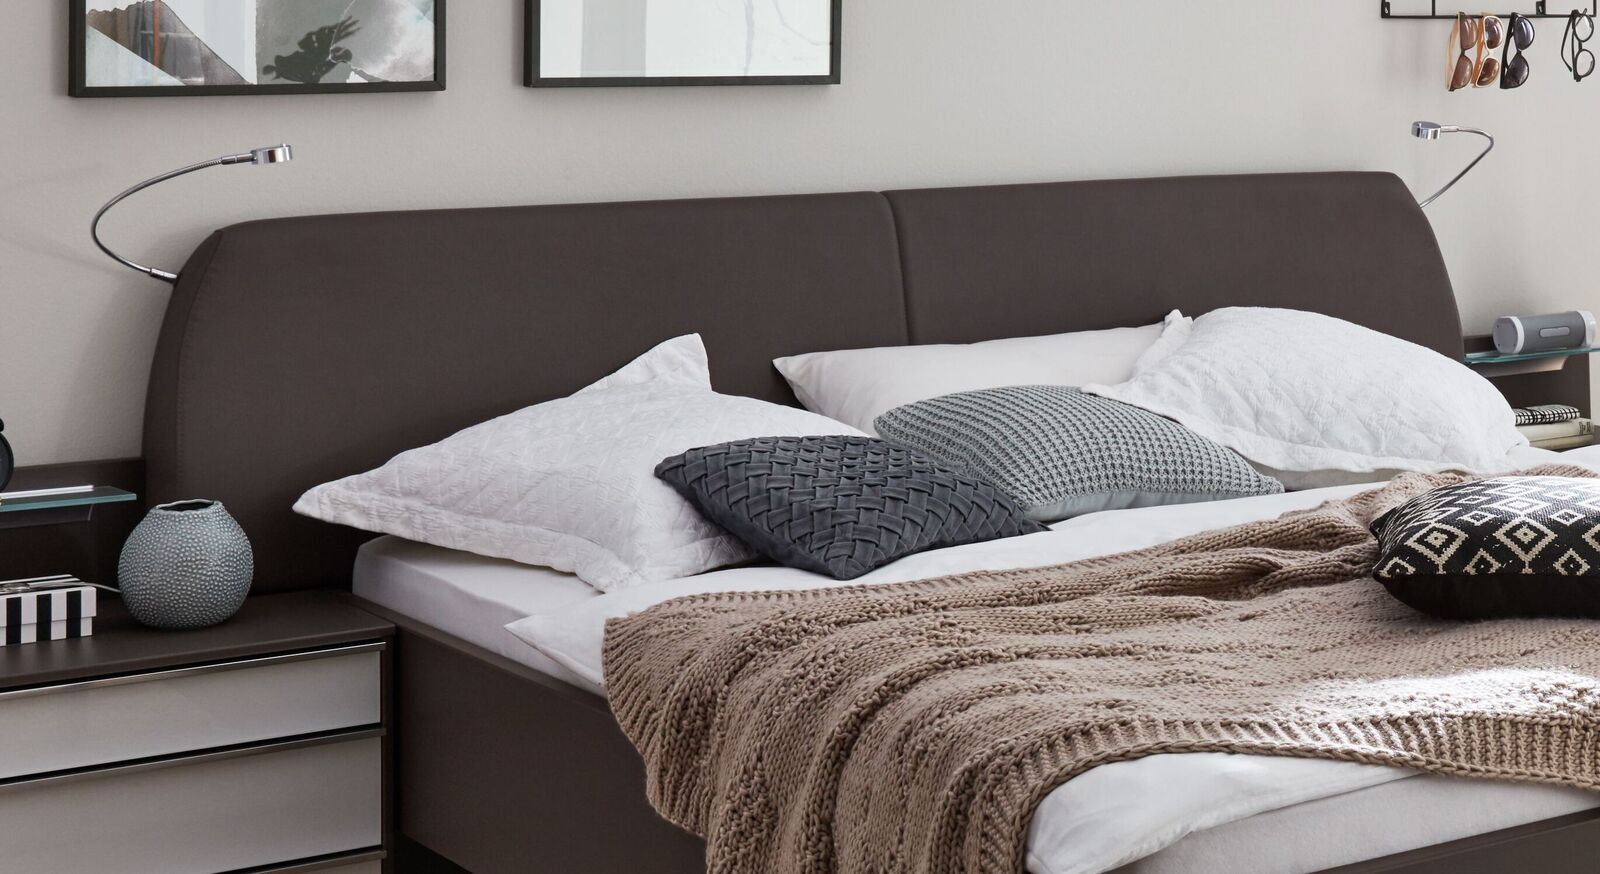 INTERLIVING Bett 1006 mit bequemem Kunstleder-Kopfteil